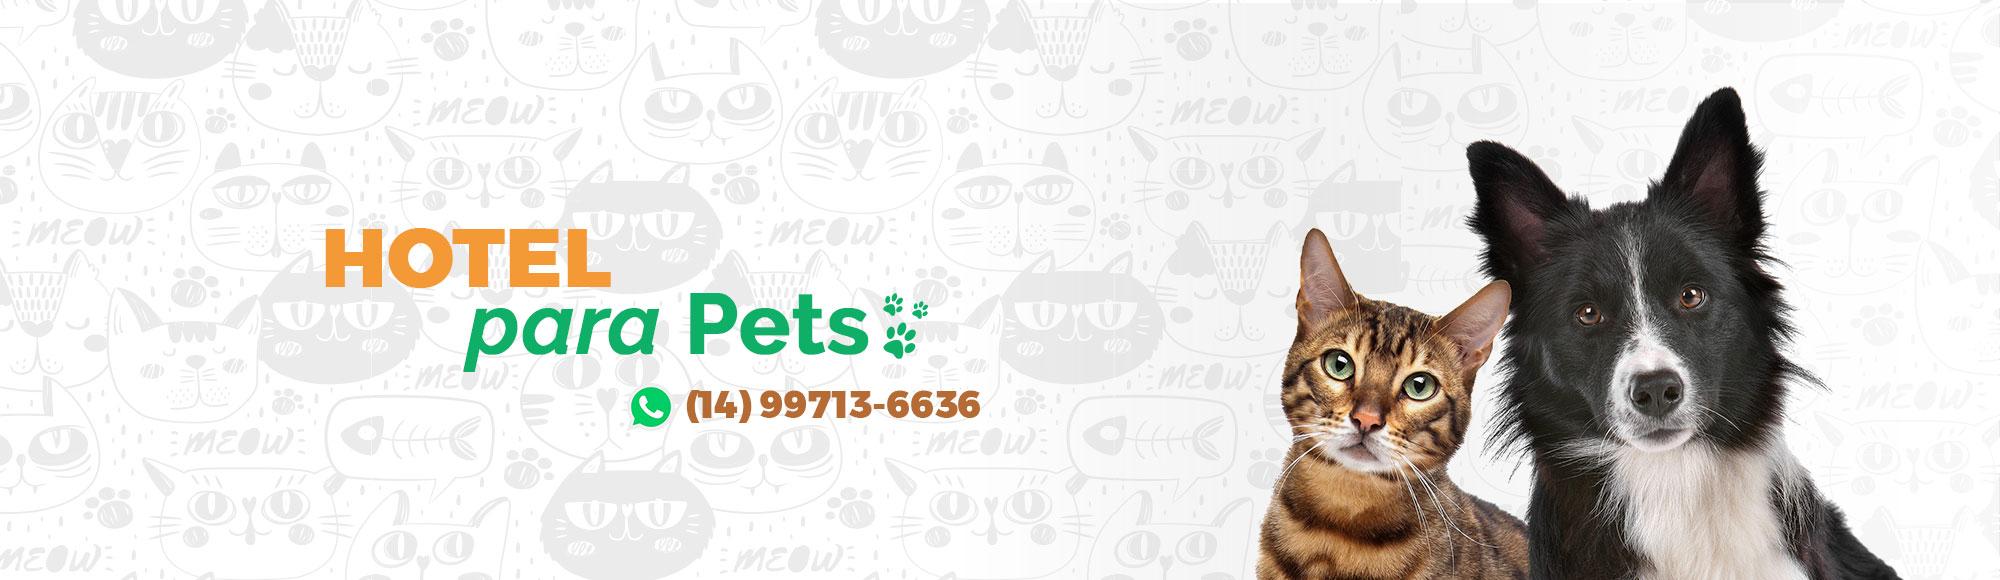 ProntoVet Bauru - Hotel para Pets